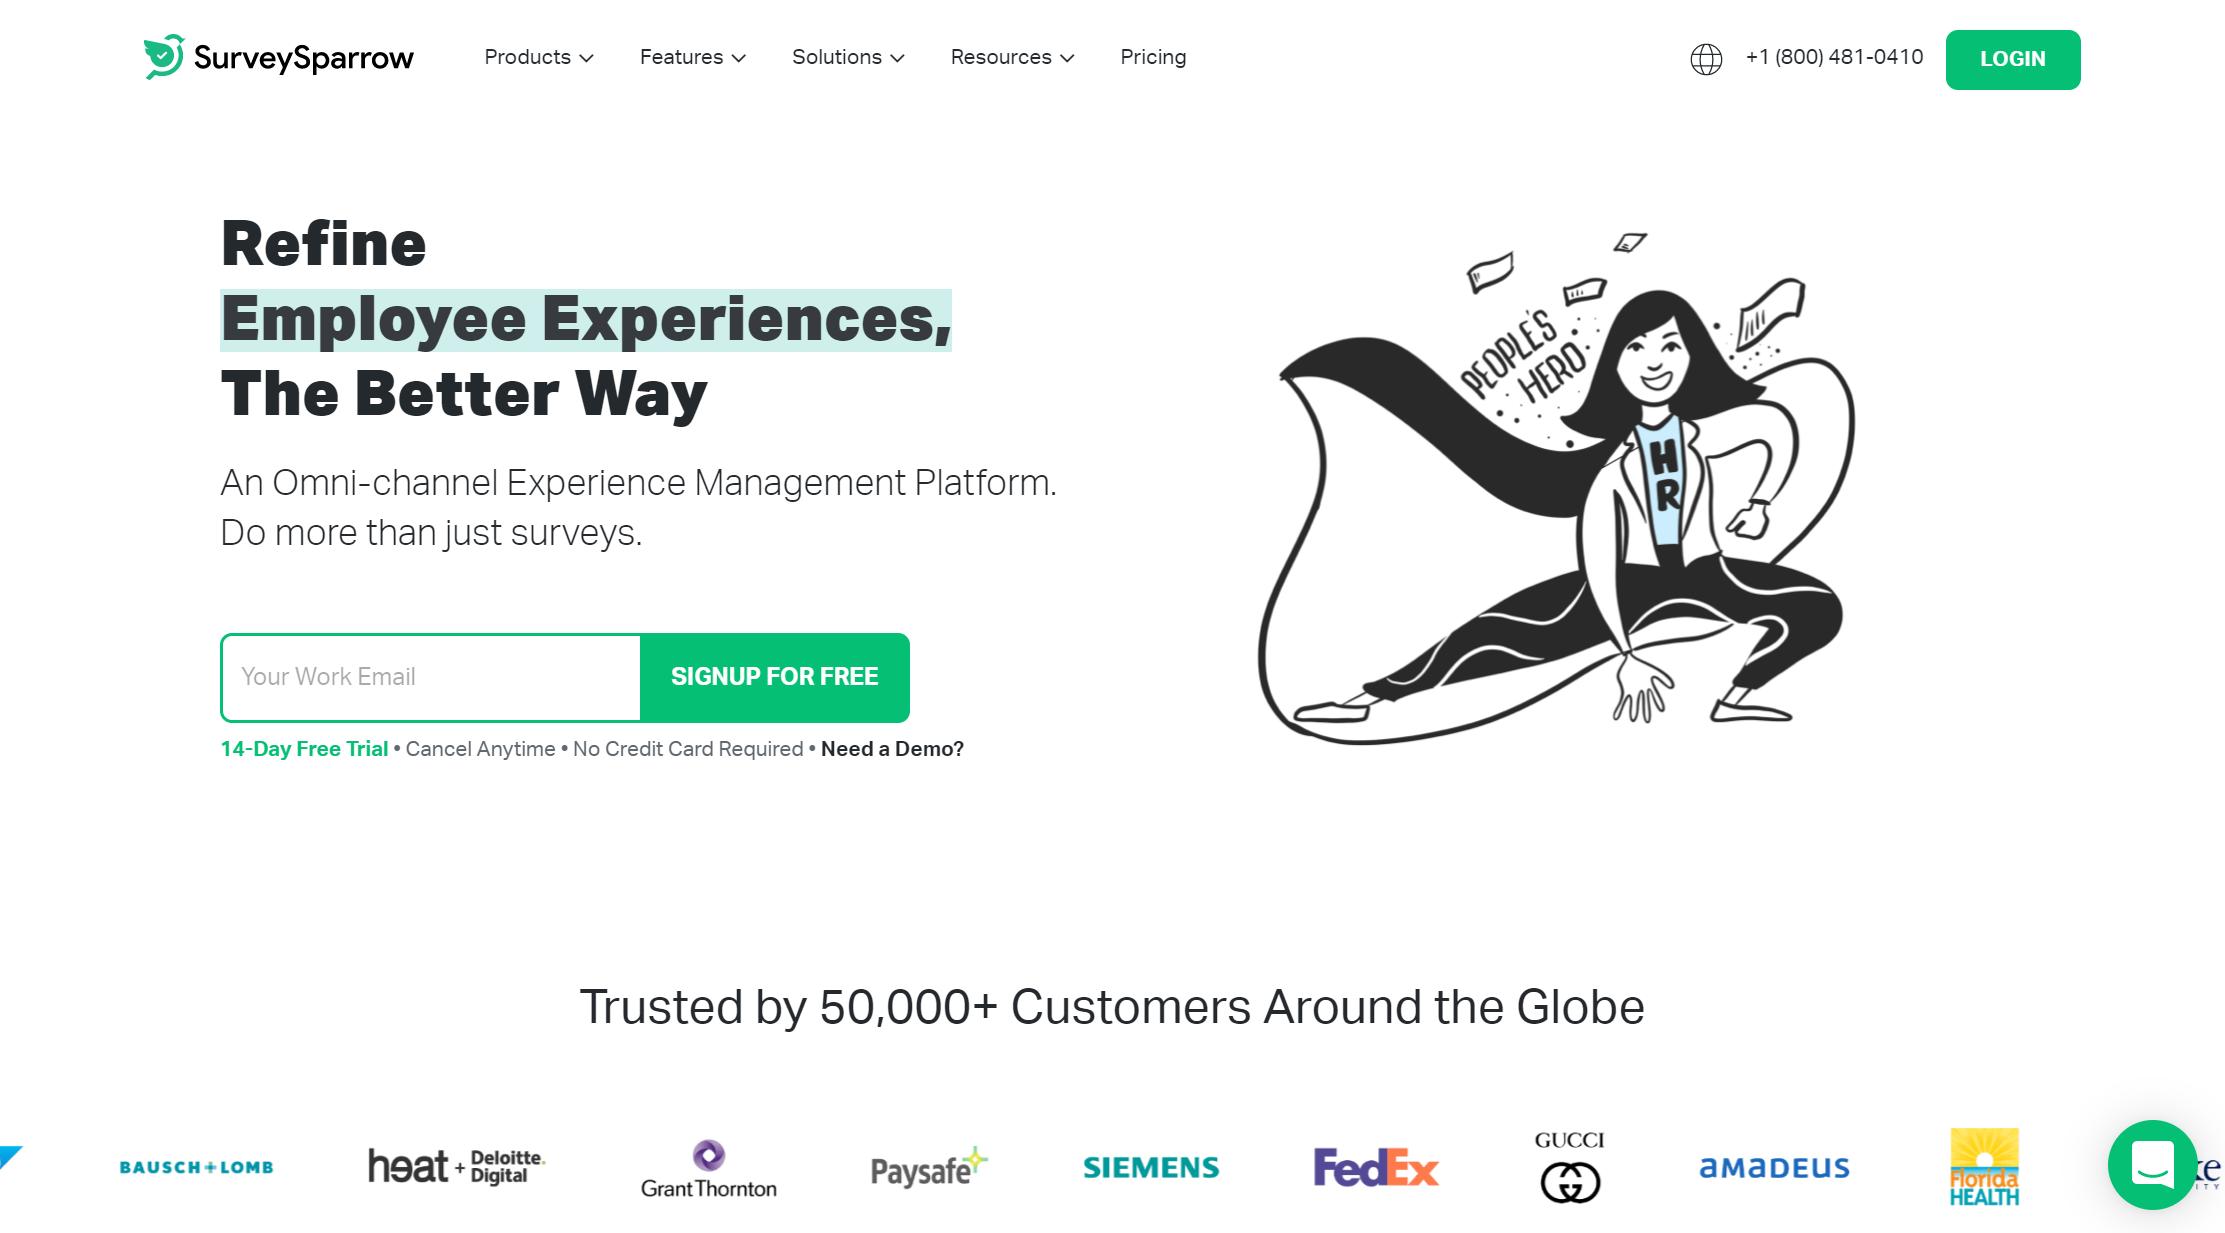 SurveySparrow email marketing tool